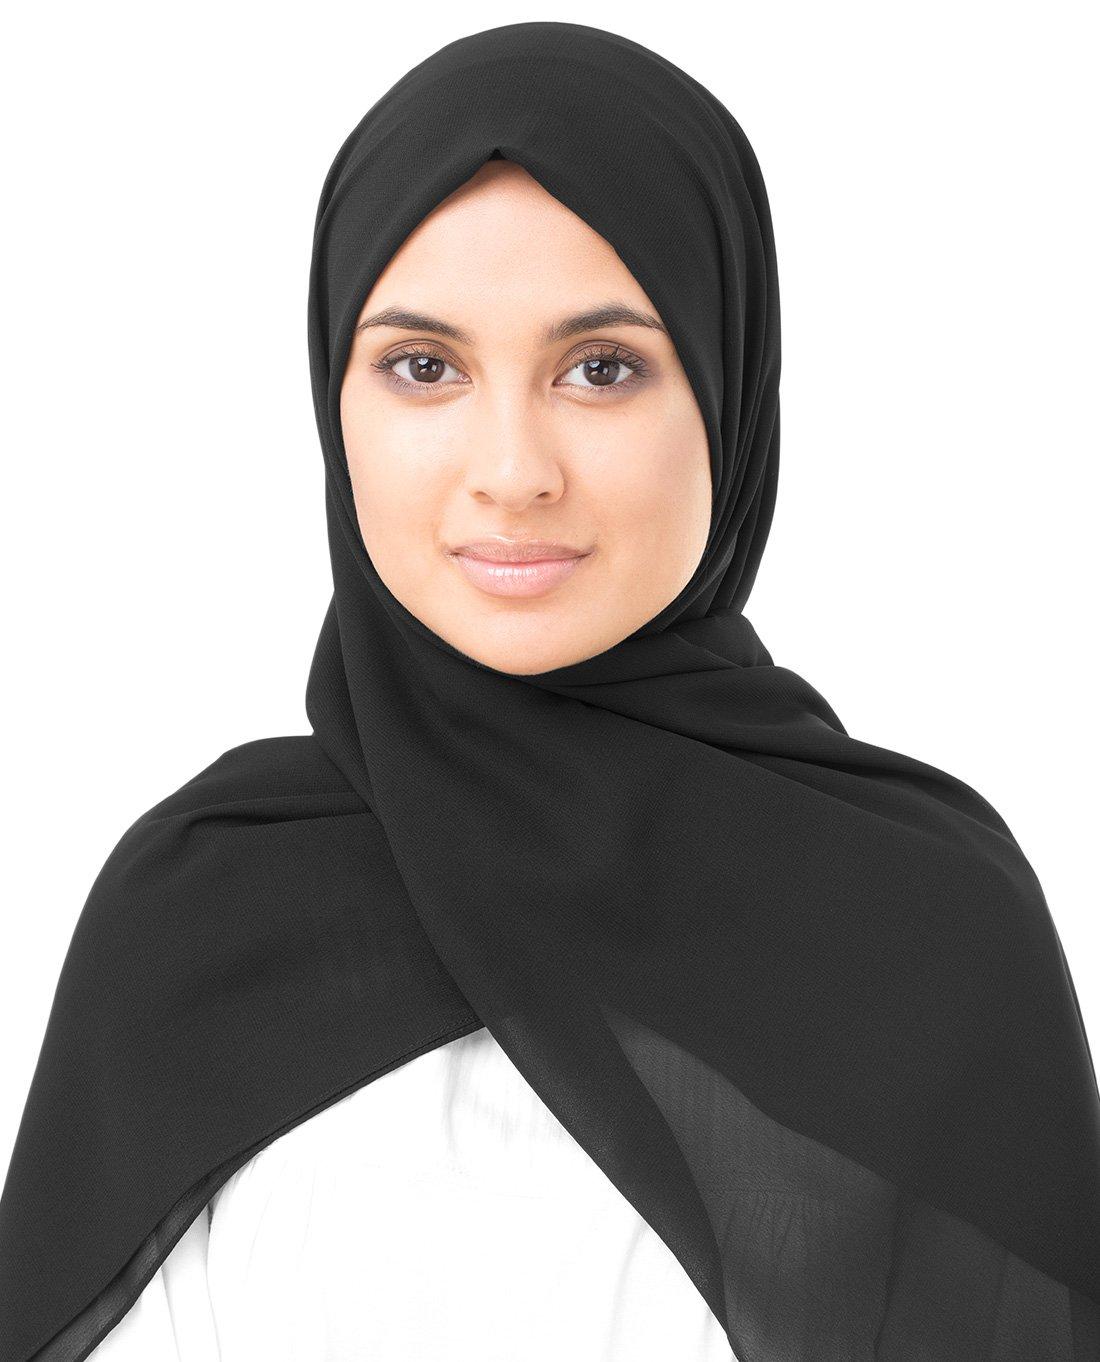 InEssence Jet Black Poly Georgette Scarf Women Girls Wrap Medium Size Hijab